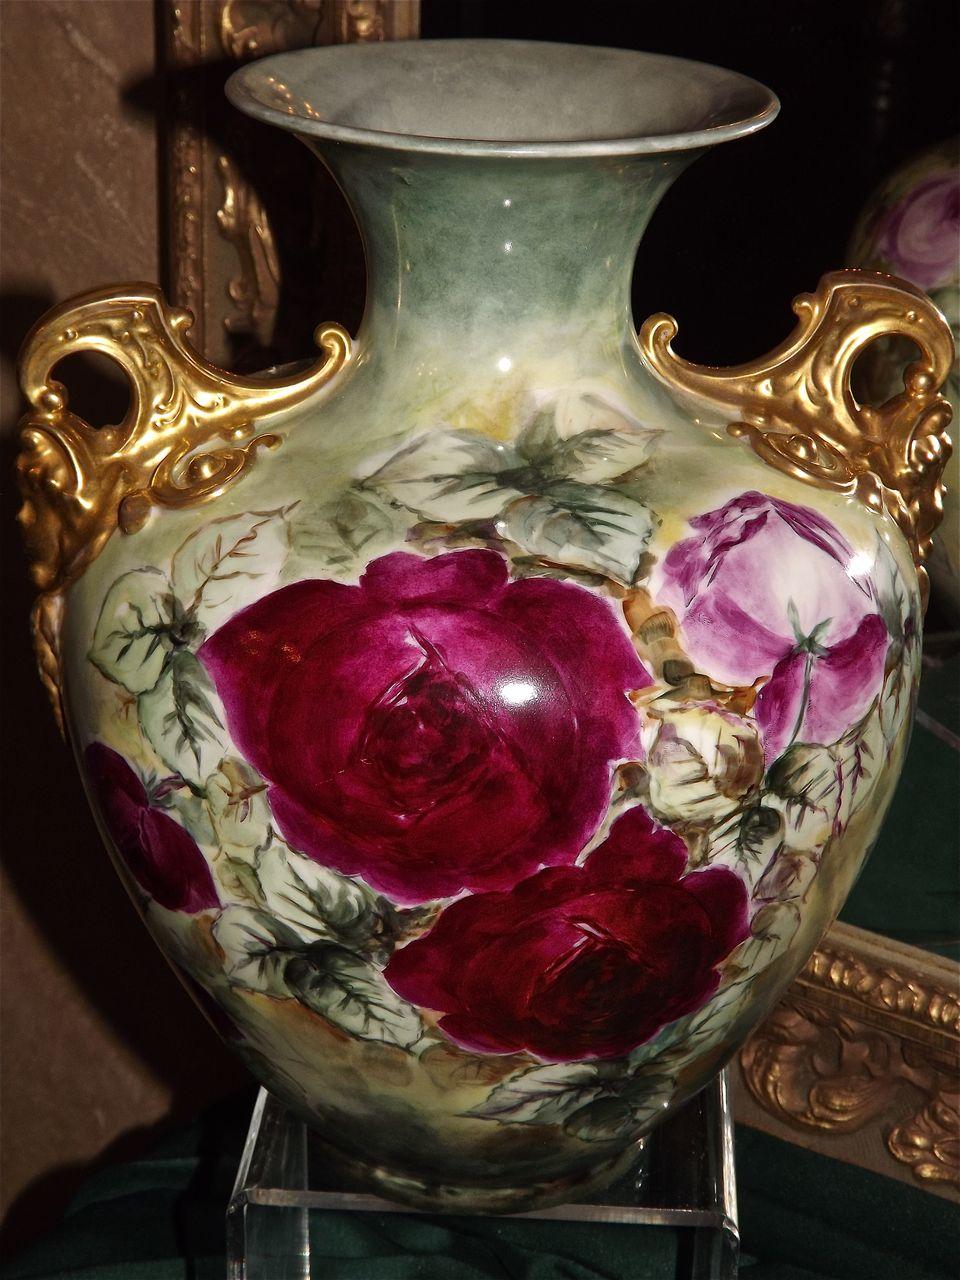 Belleek Rare Gold Cherub Handled Vase With Gorgeous Red